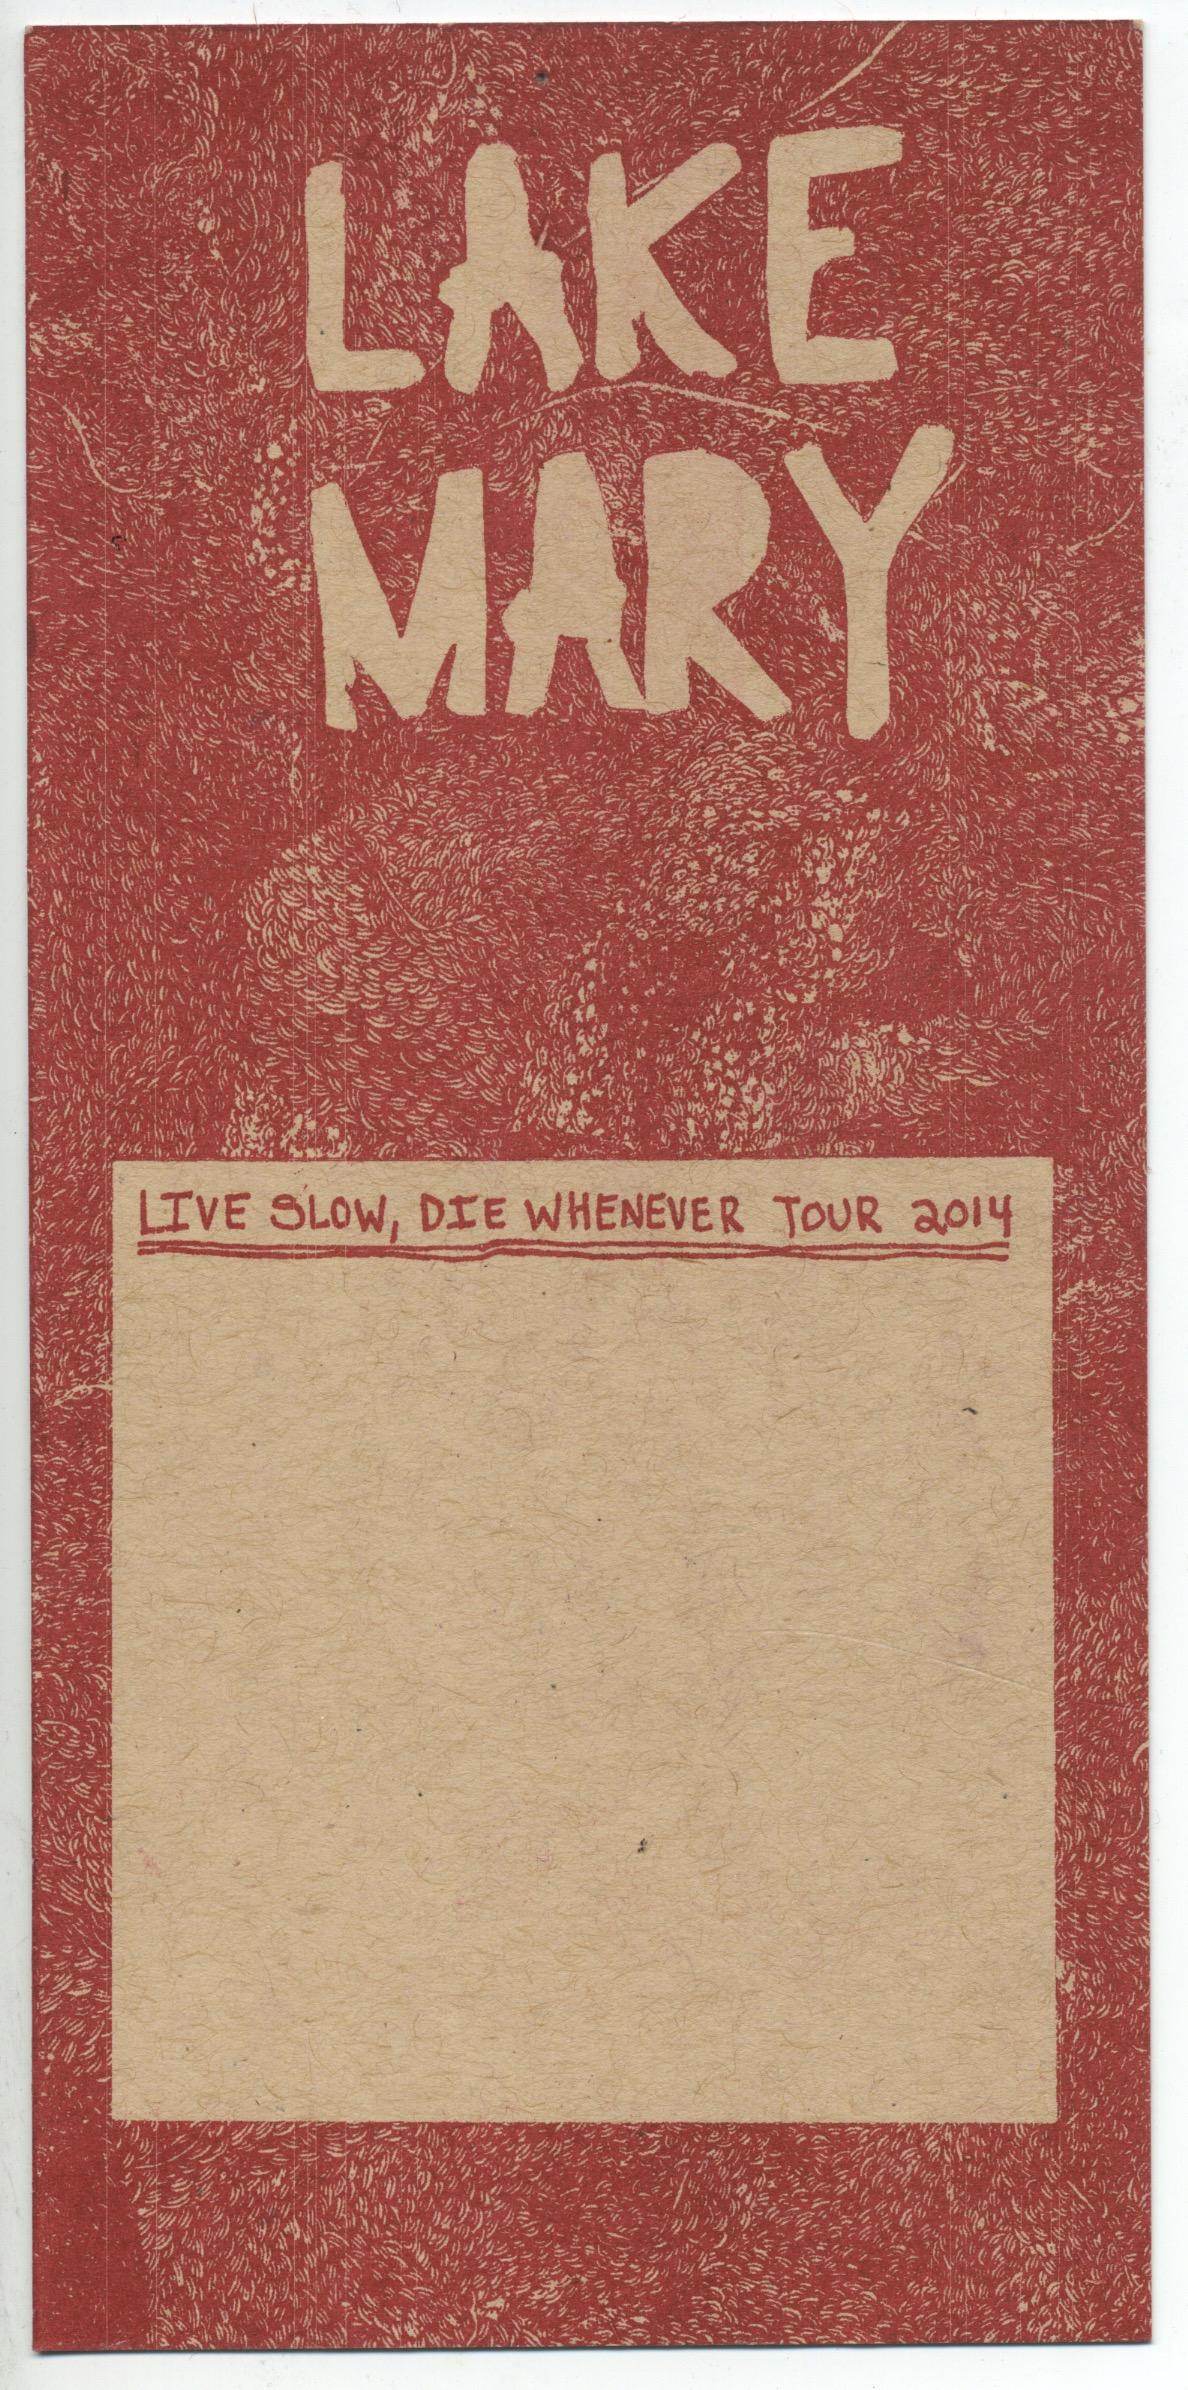 Lake Mary Tour Flier.jpeg